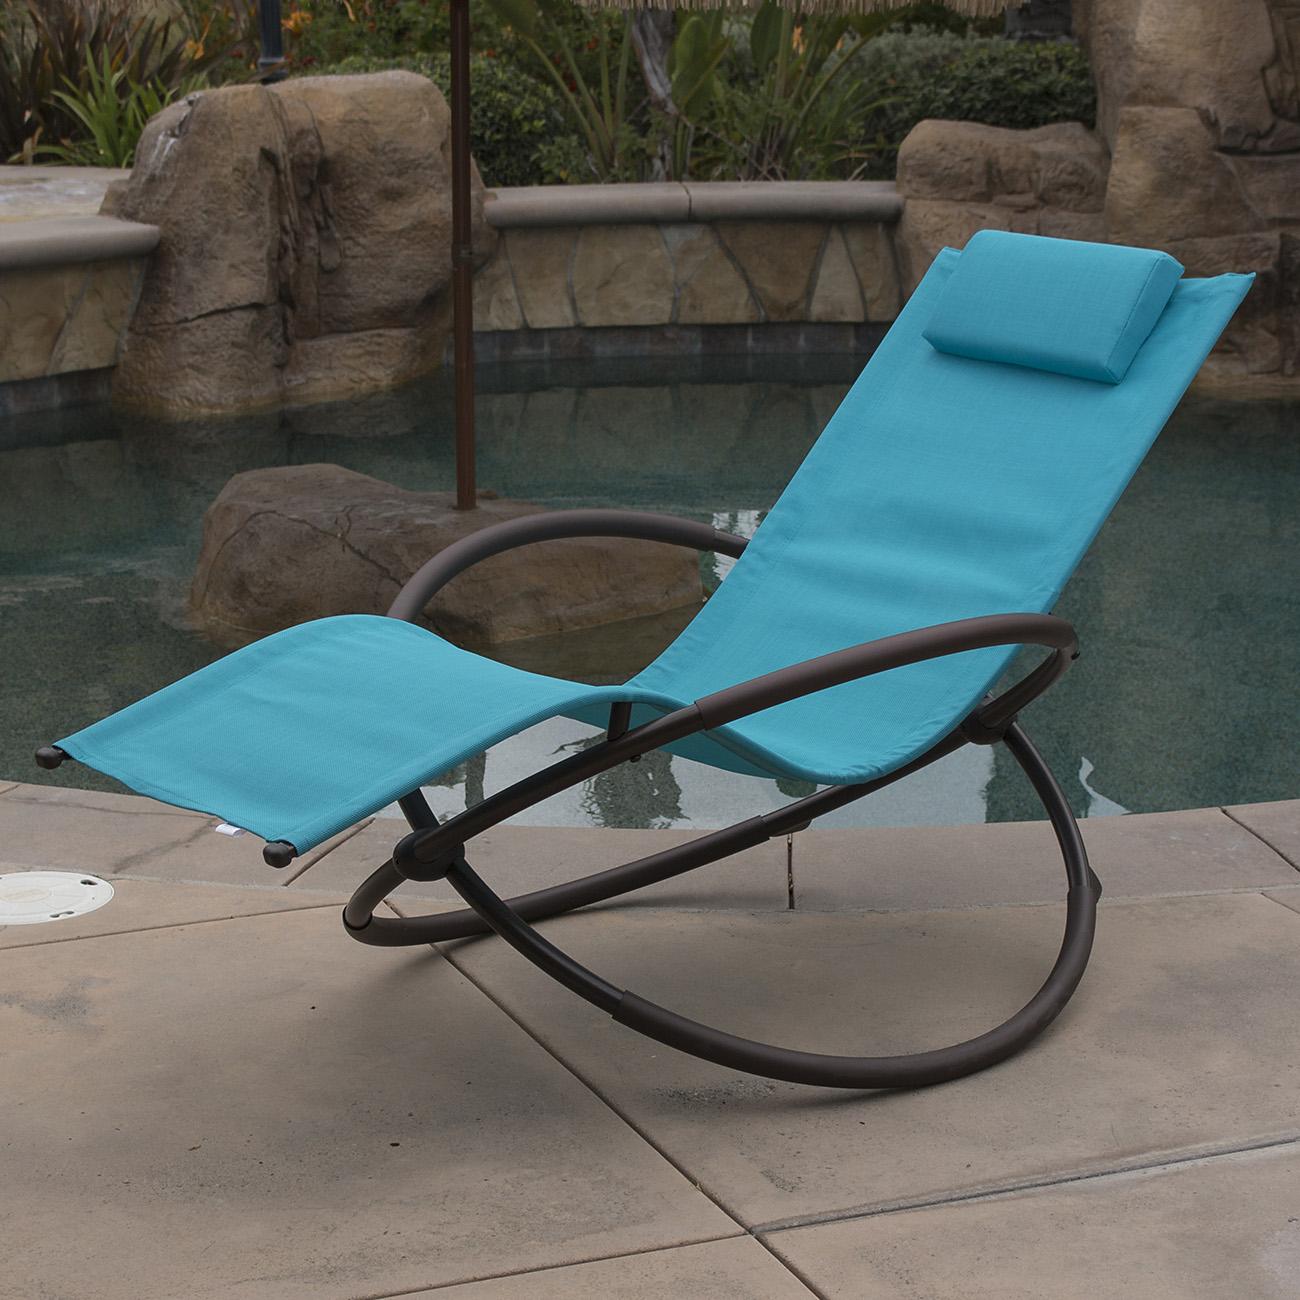 7 Color Orbital Zero Anti Gravity Lounge Chair Beach Pool